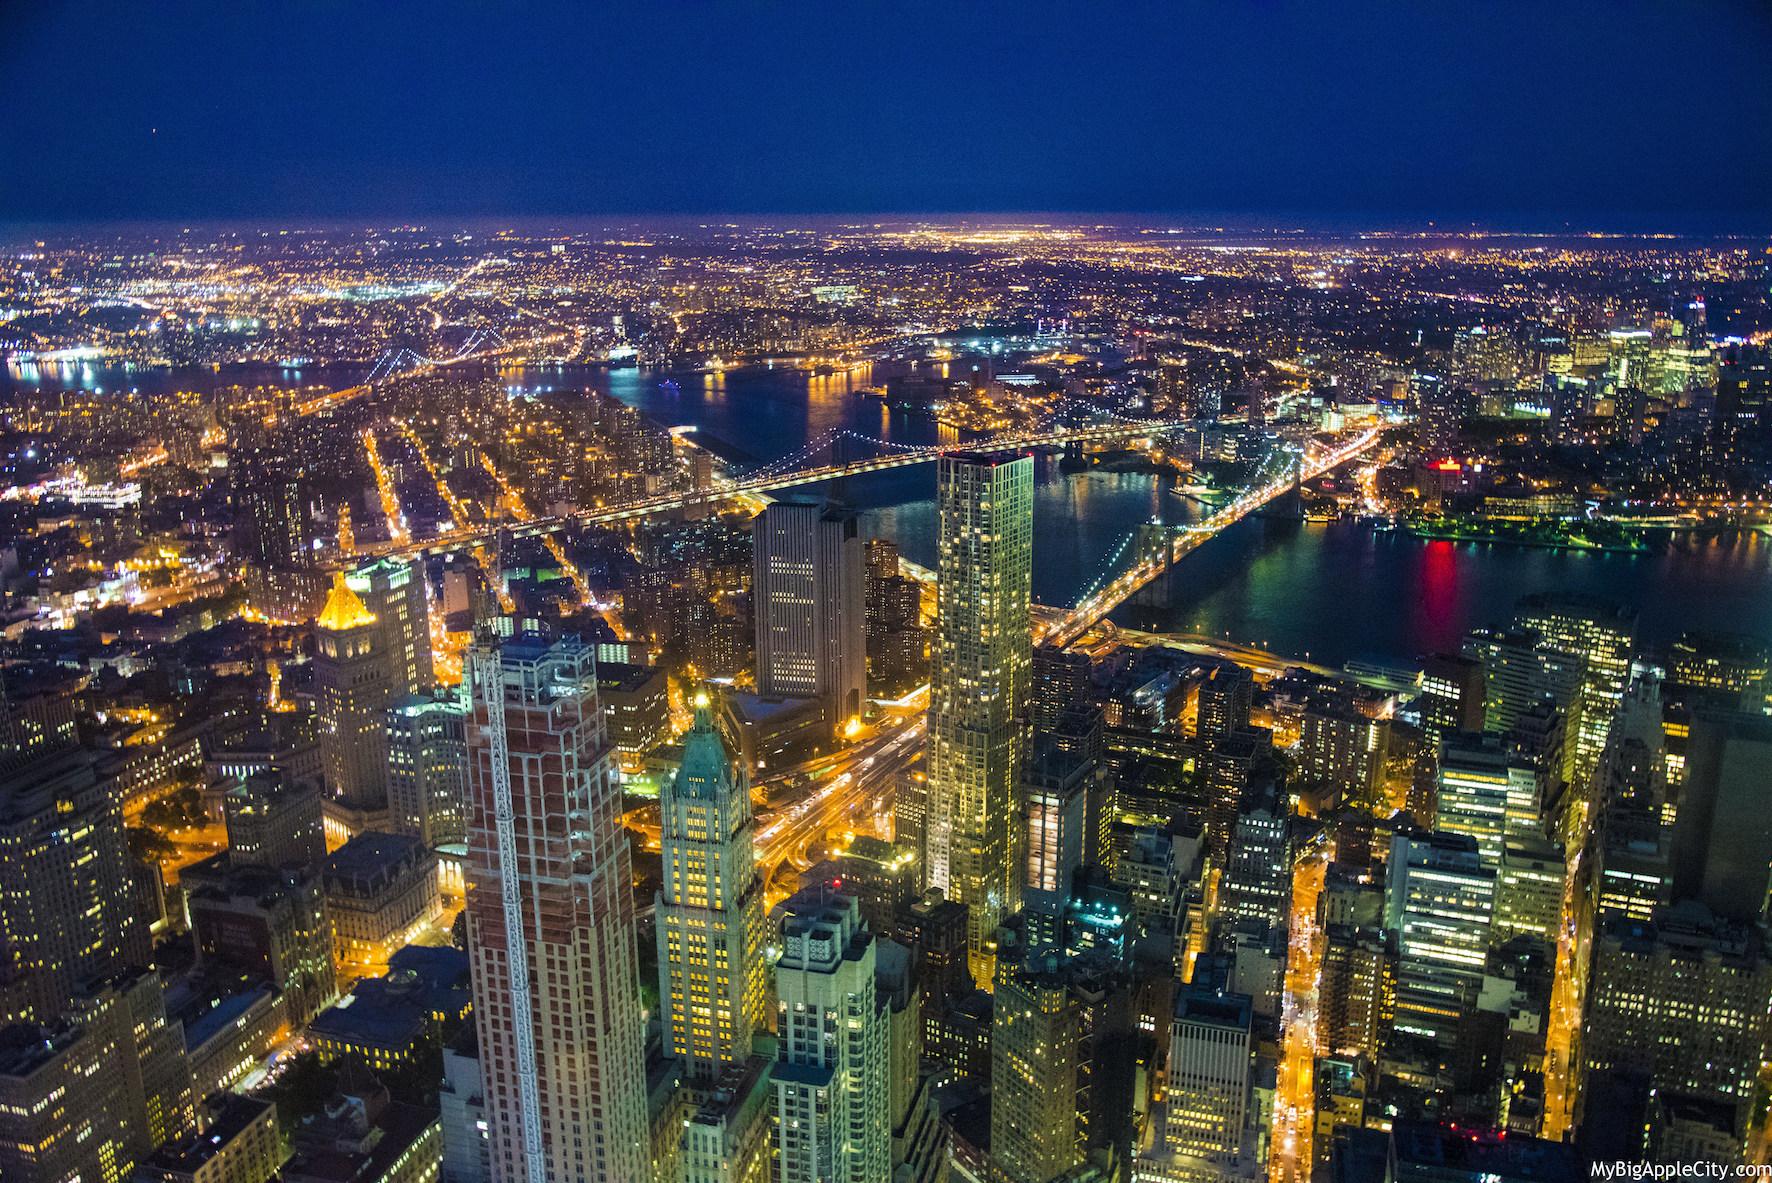 Night-View-One-WTC-Travel-photo-New-York-MyBigAppleCity